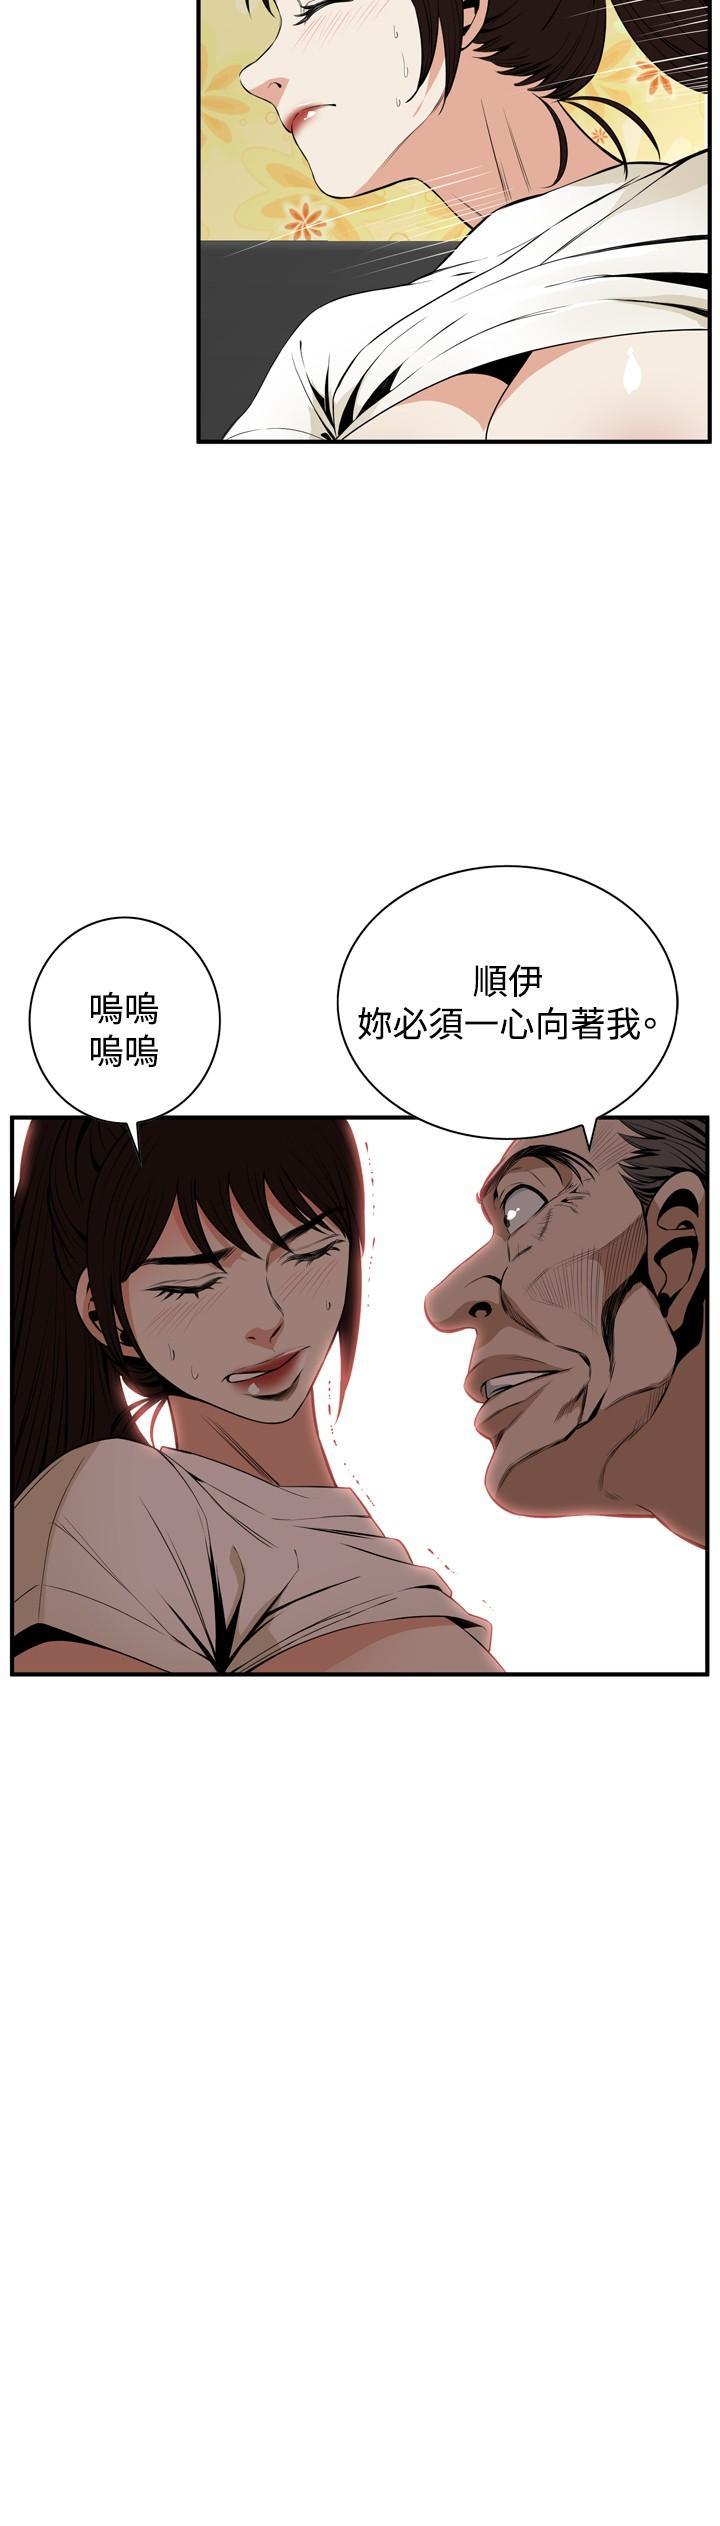 Take a Peek 偷窥 Ch.39~51 [Chinese]中文 9